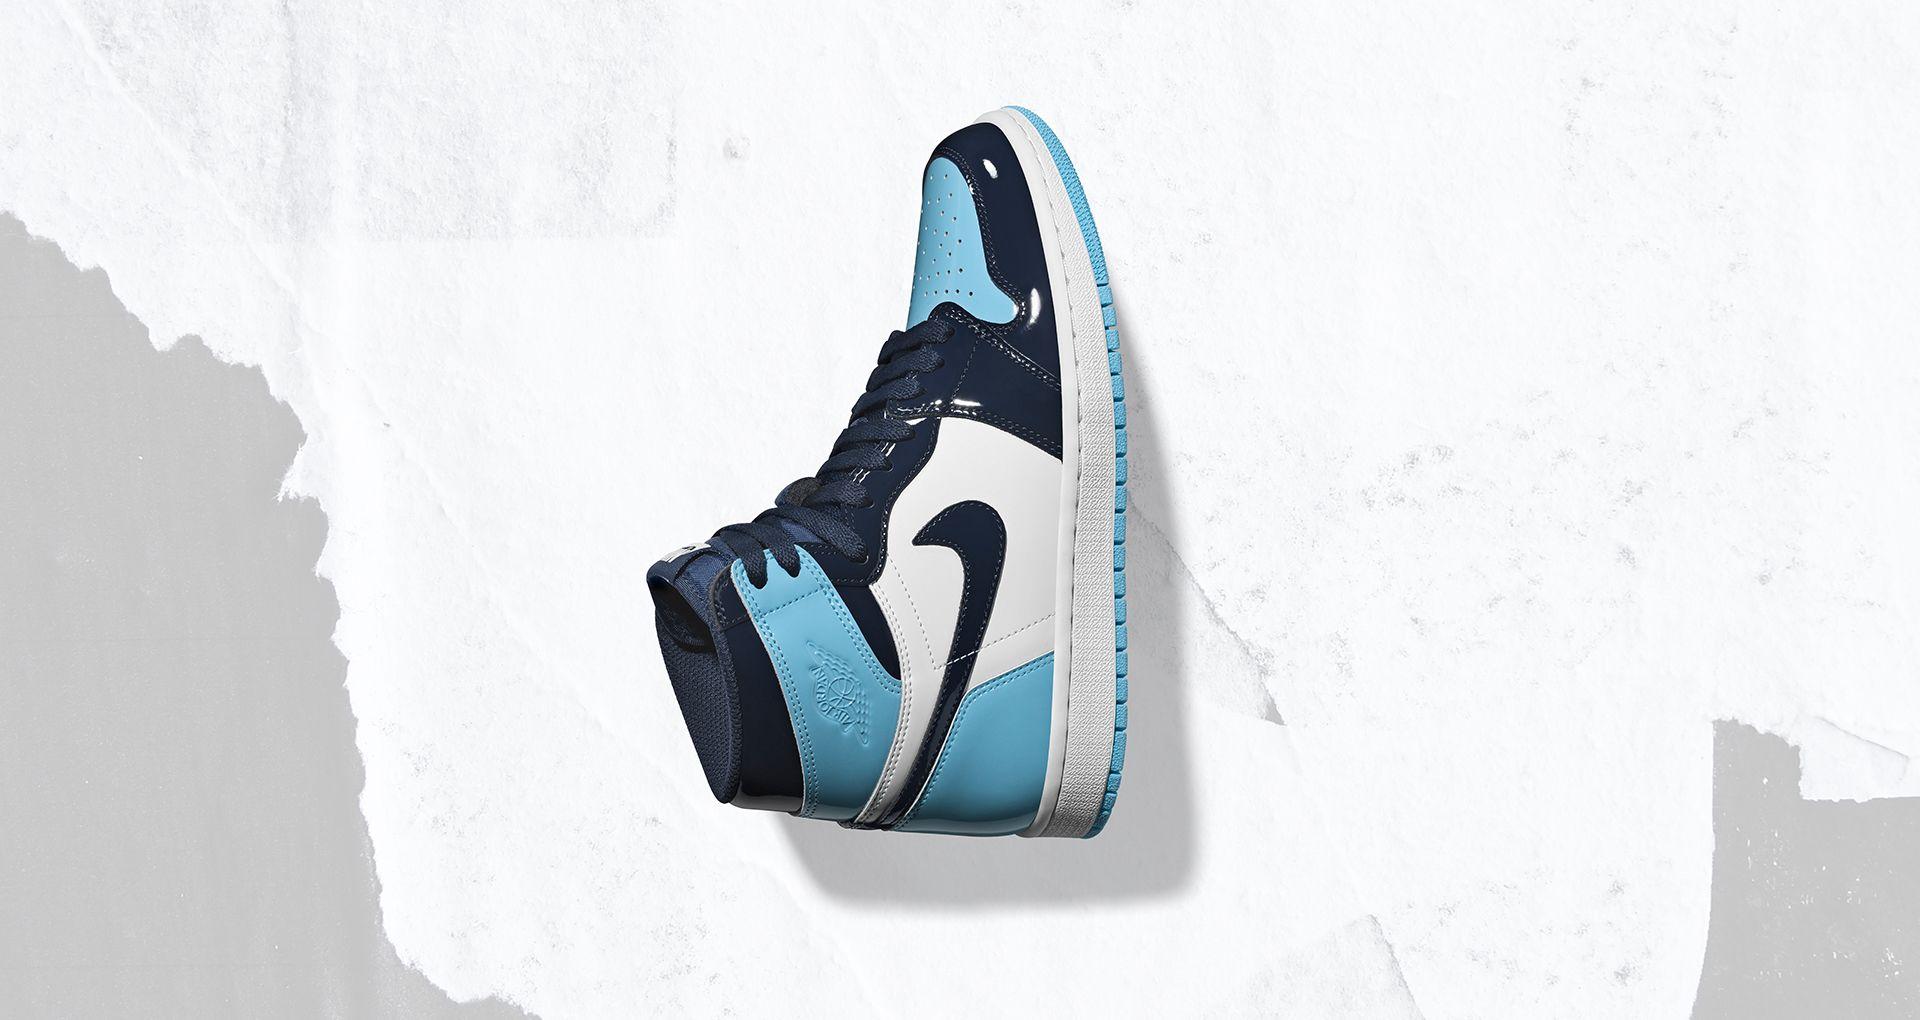 39b813f016b Nike X Jordan Brand: All-Star Collection. Nike+ SNKRS